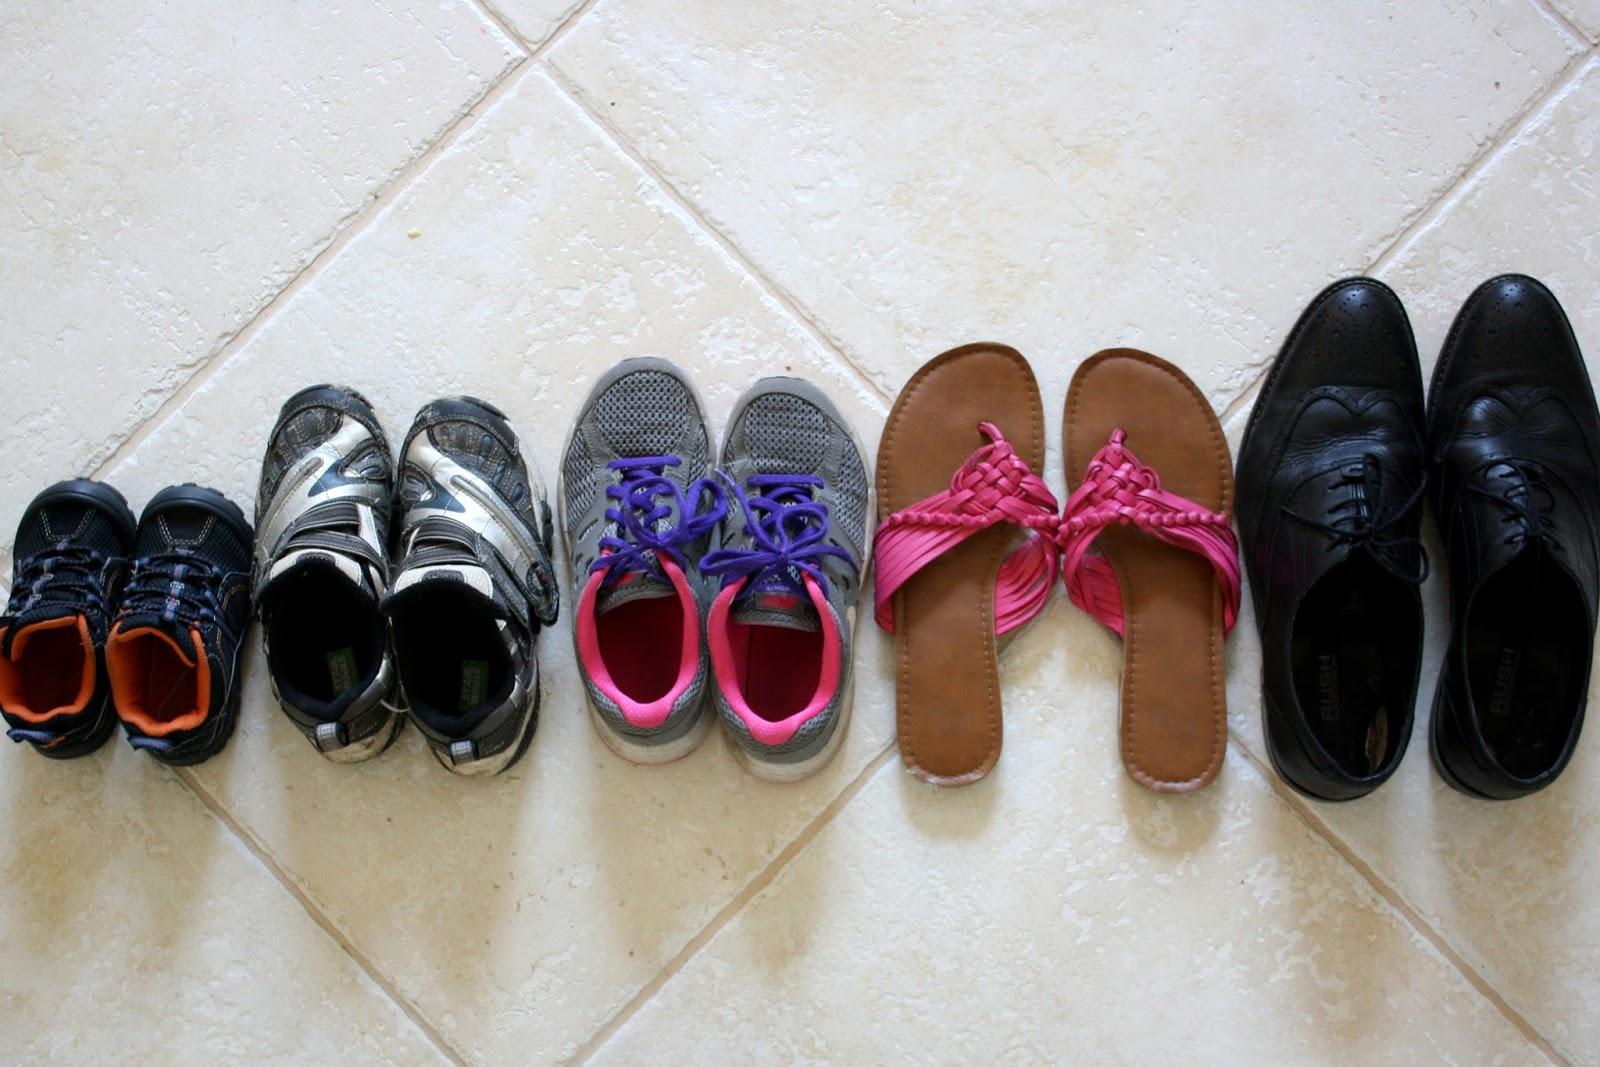 The Educators Spin On It Shoe Activities For Preschool